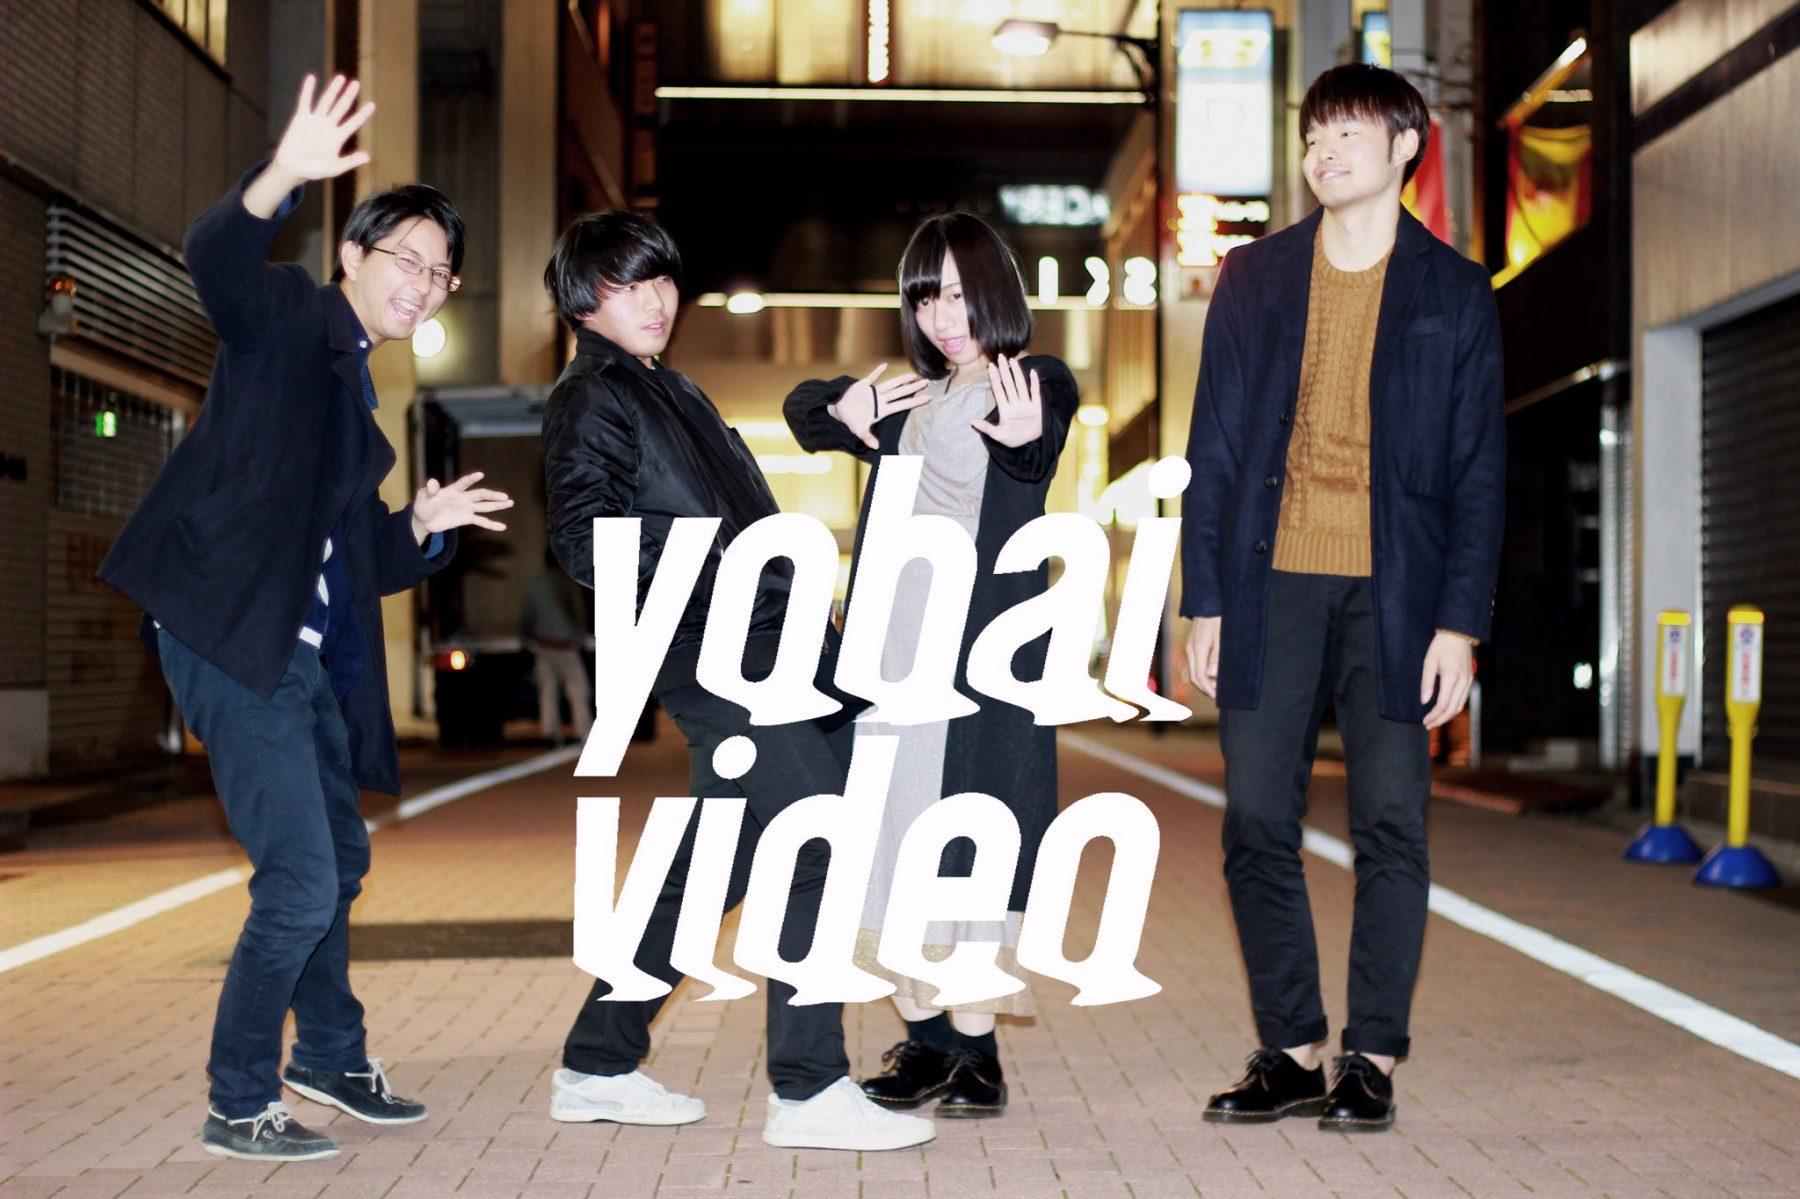 yobai-video